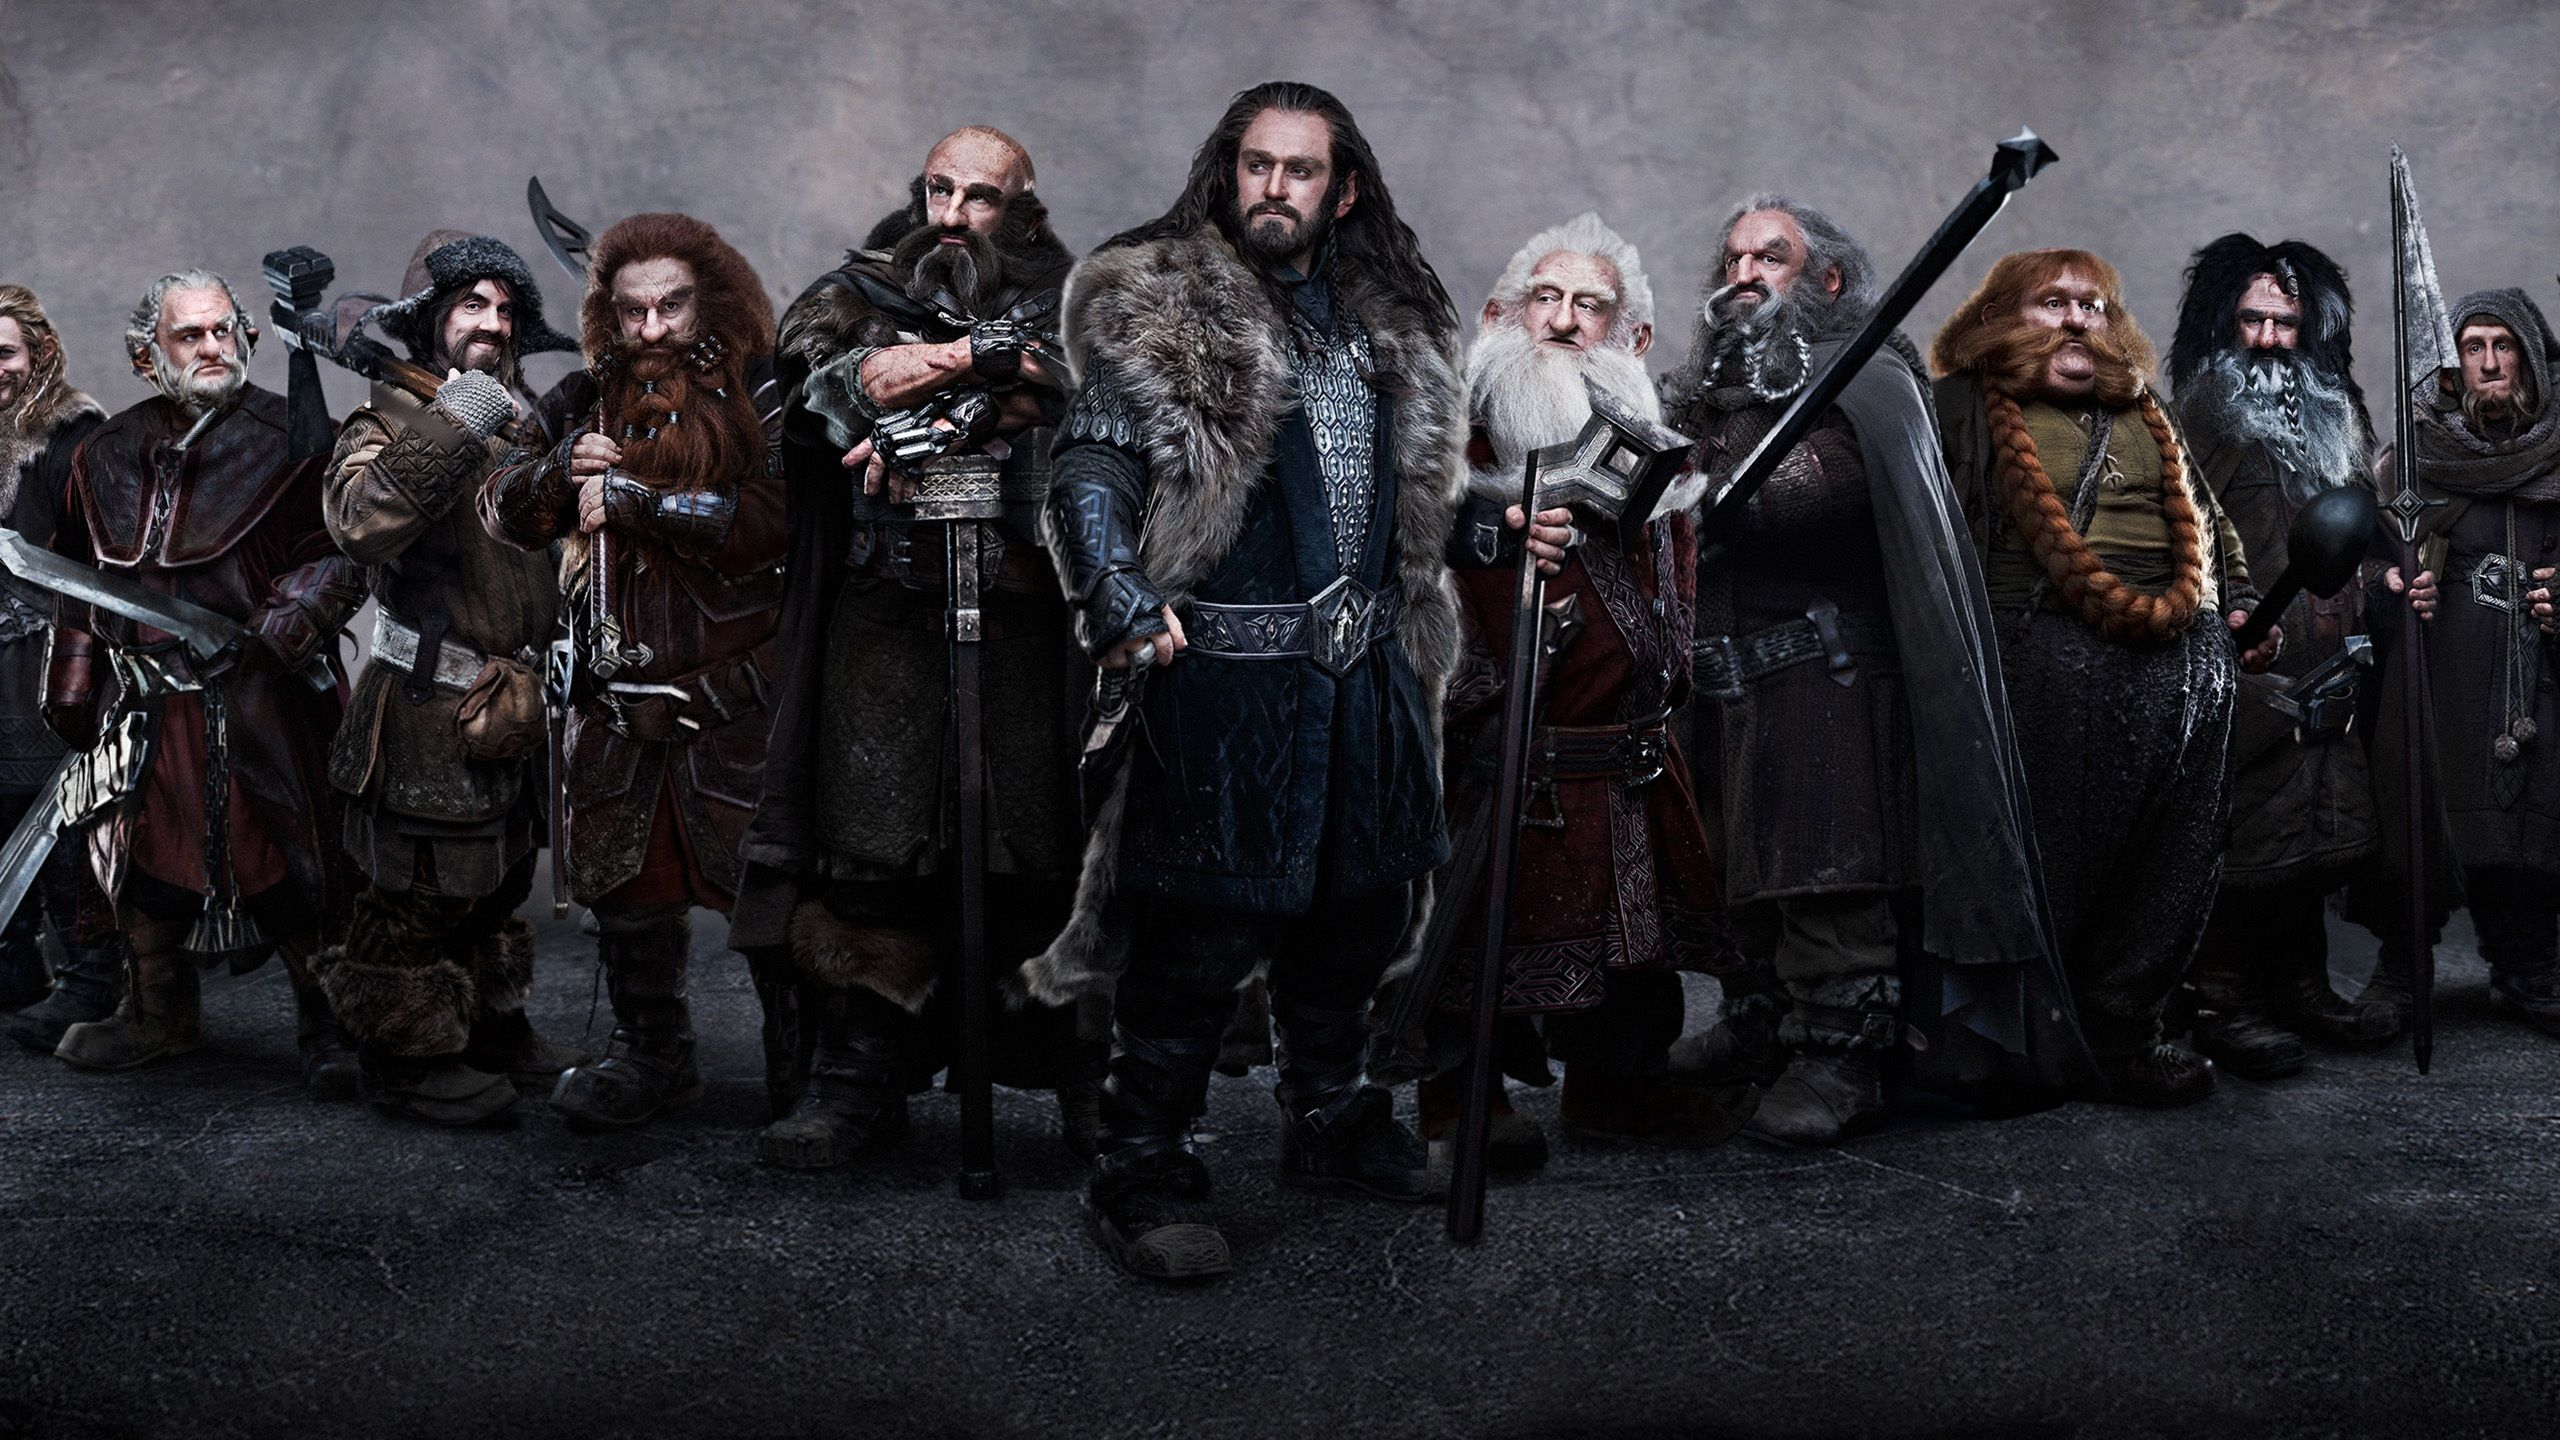 Bilbo Baggins Dwalin and Balin in The Hobbit Movie HD Wallpaper